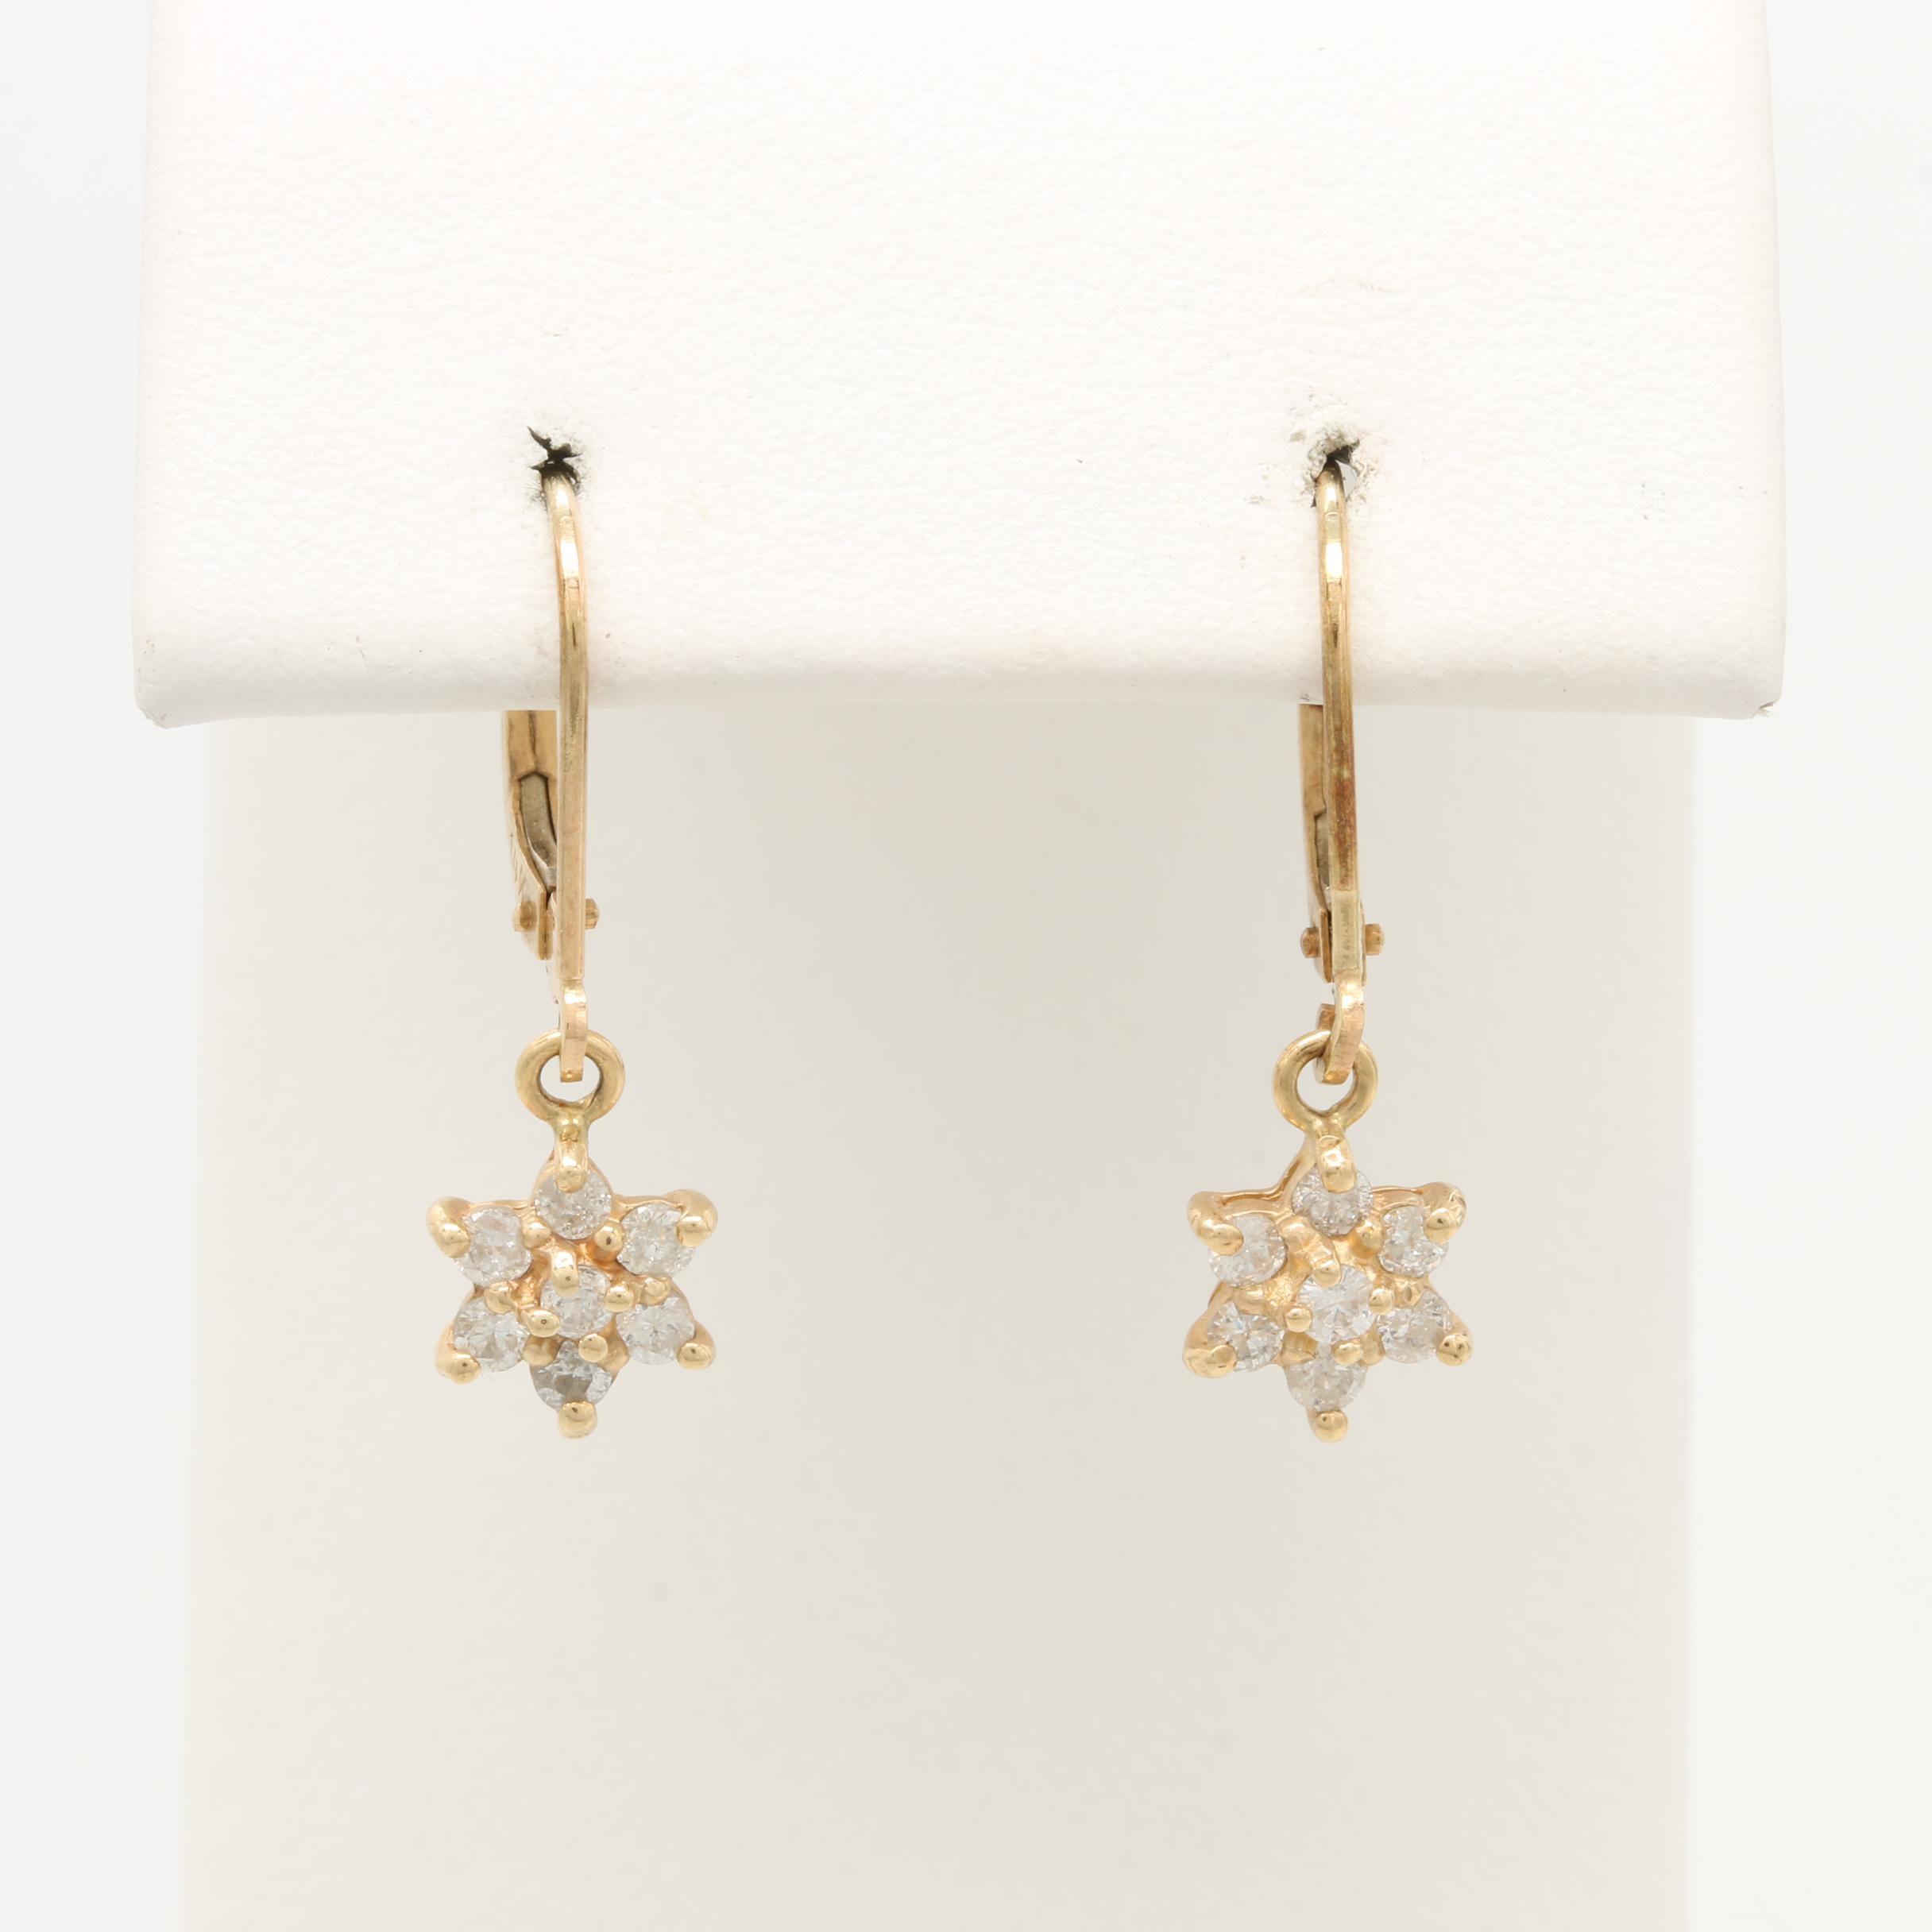 14K Yellow Gold Diamond Star Earrings